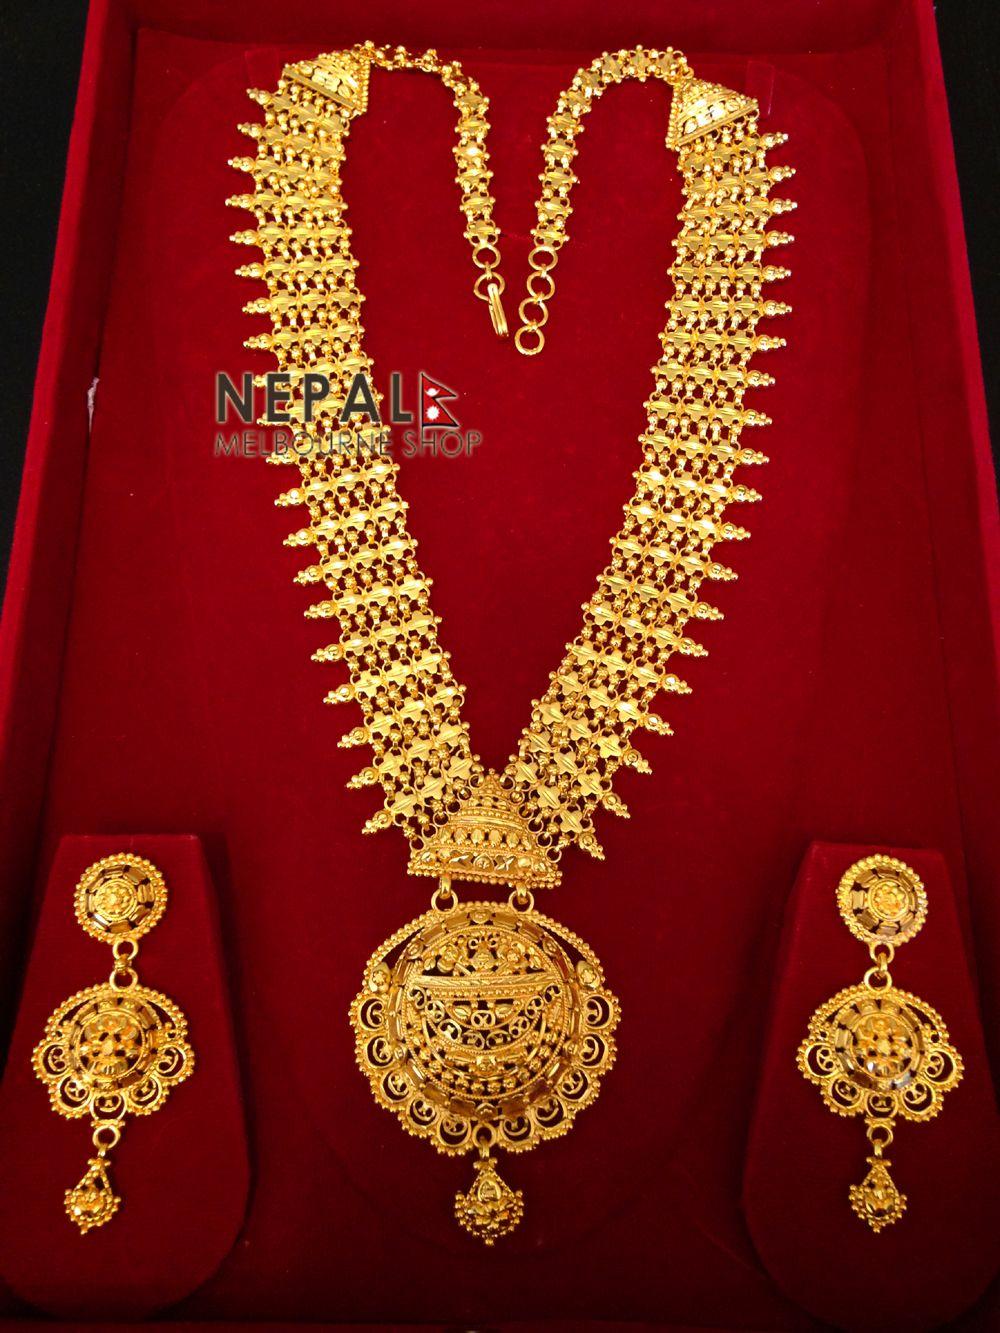 raani haar pearl - Google Search | jewellery | Pinterest | Pearls ...